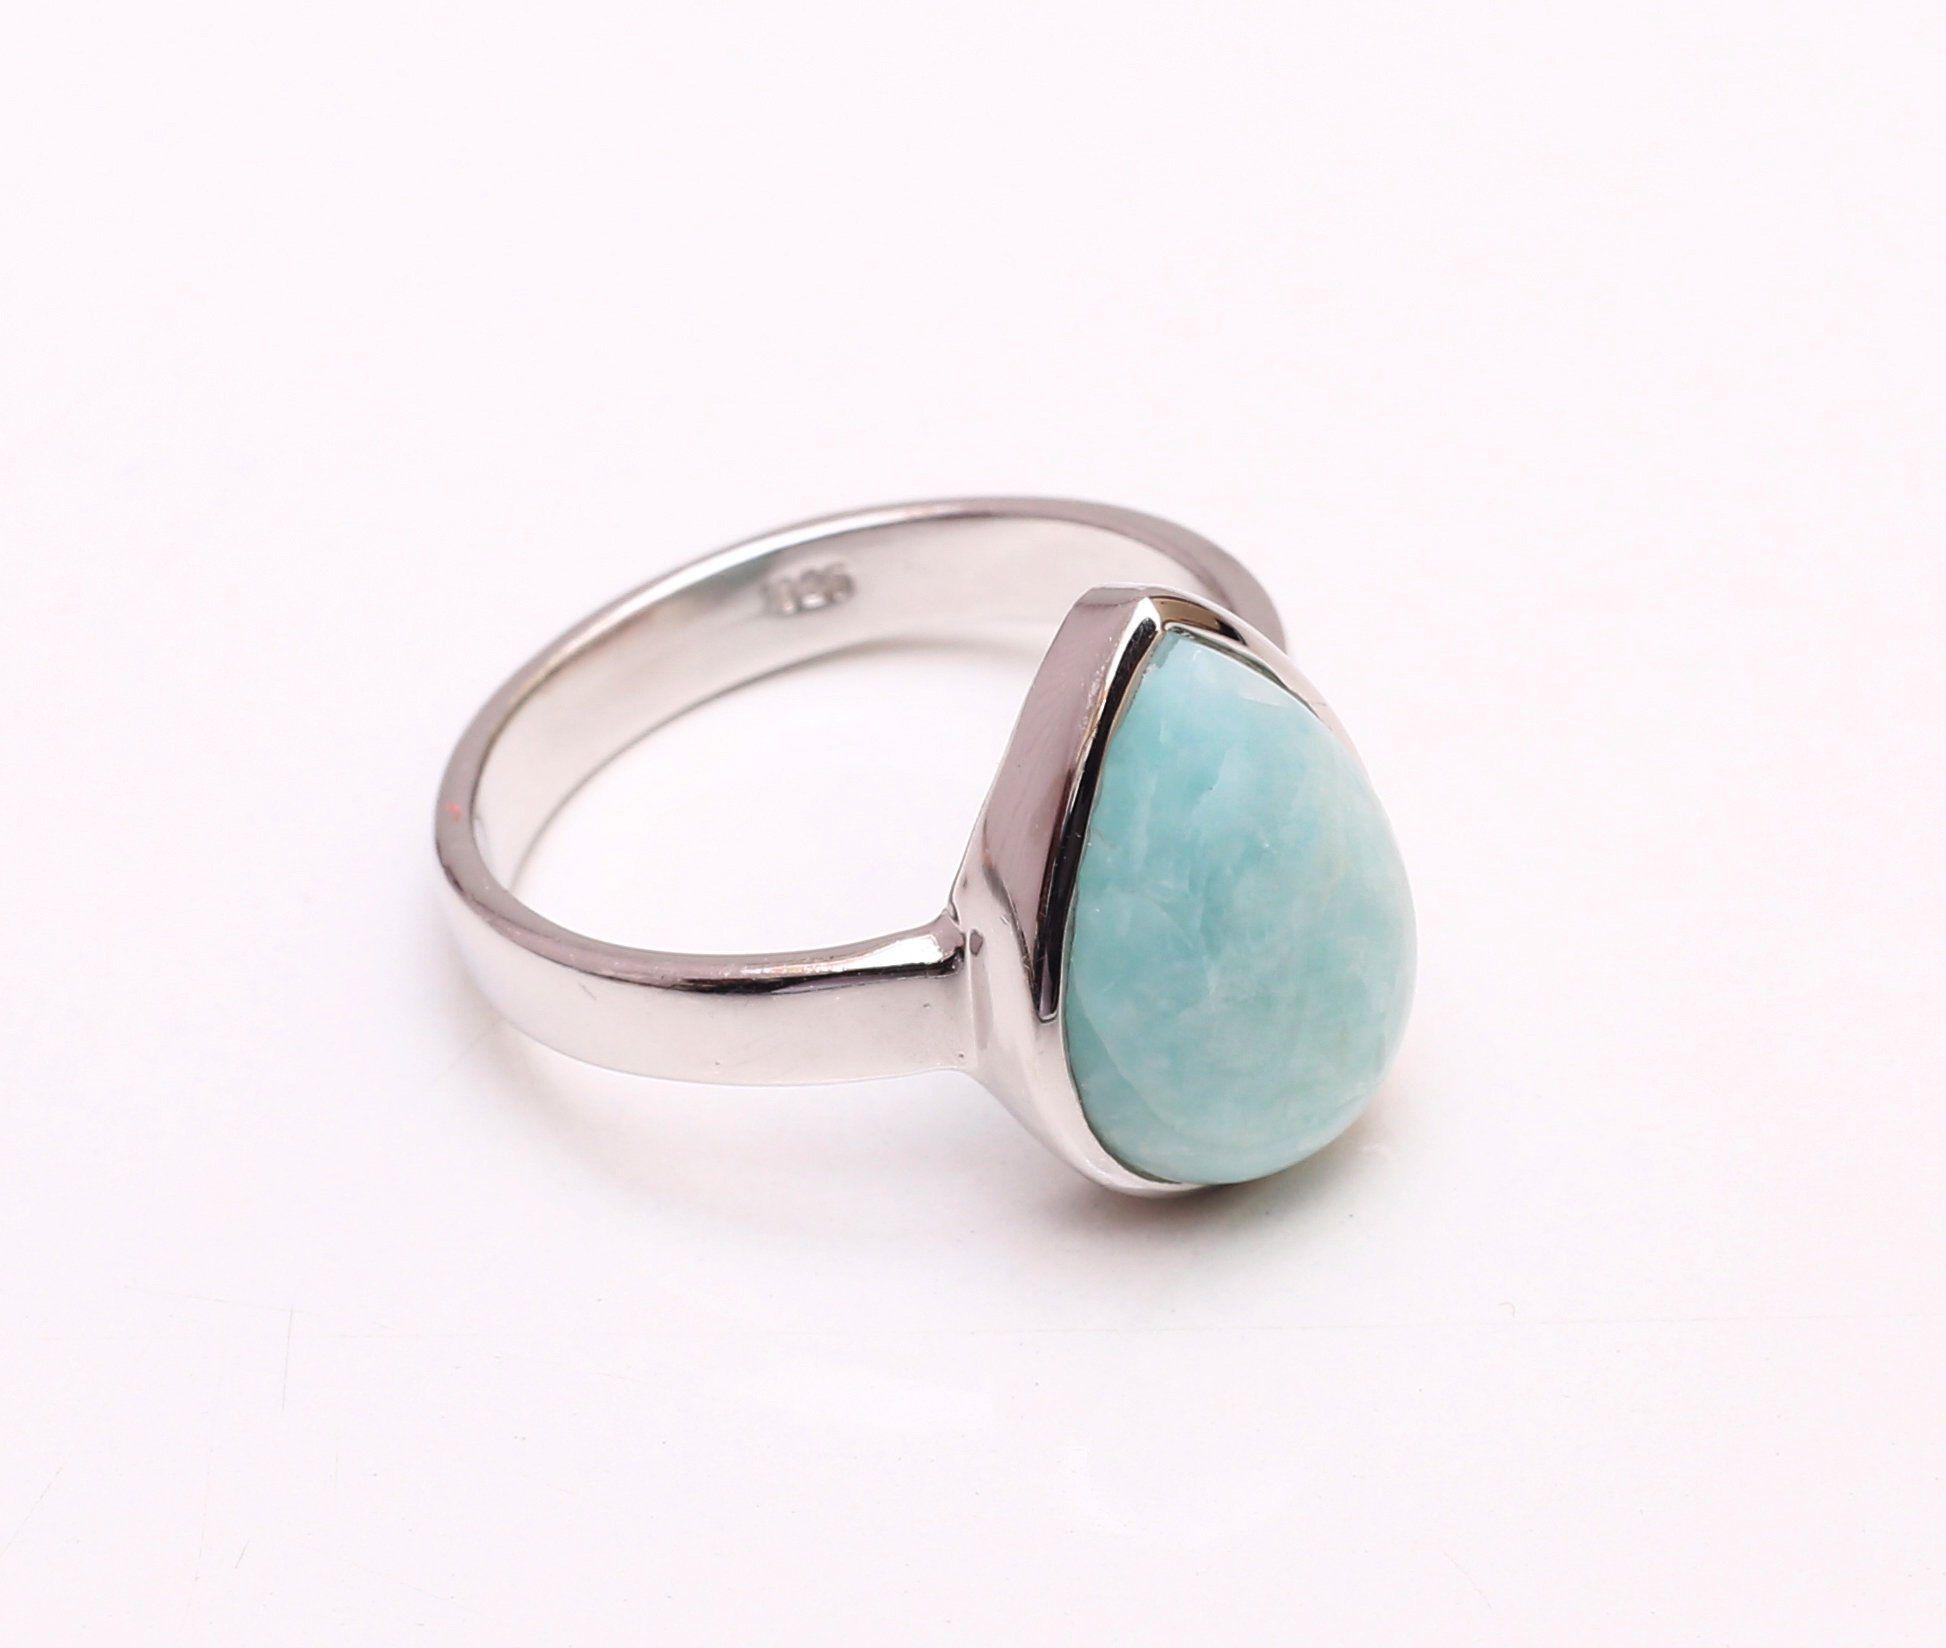 Natural Larimar Ring Larimar Silver Ring Sterling Silver Ring Solid Silver Bands Boho Ring Geometric Ring Gemstone Rings Silver Earrings Outfit Boho Rings